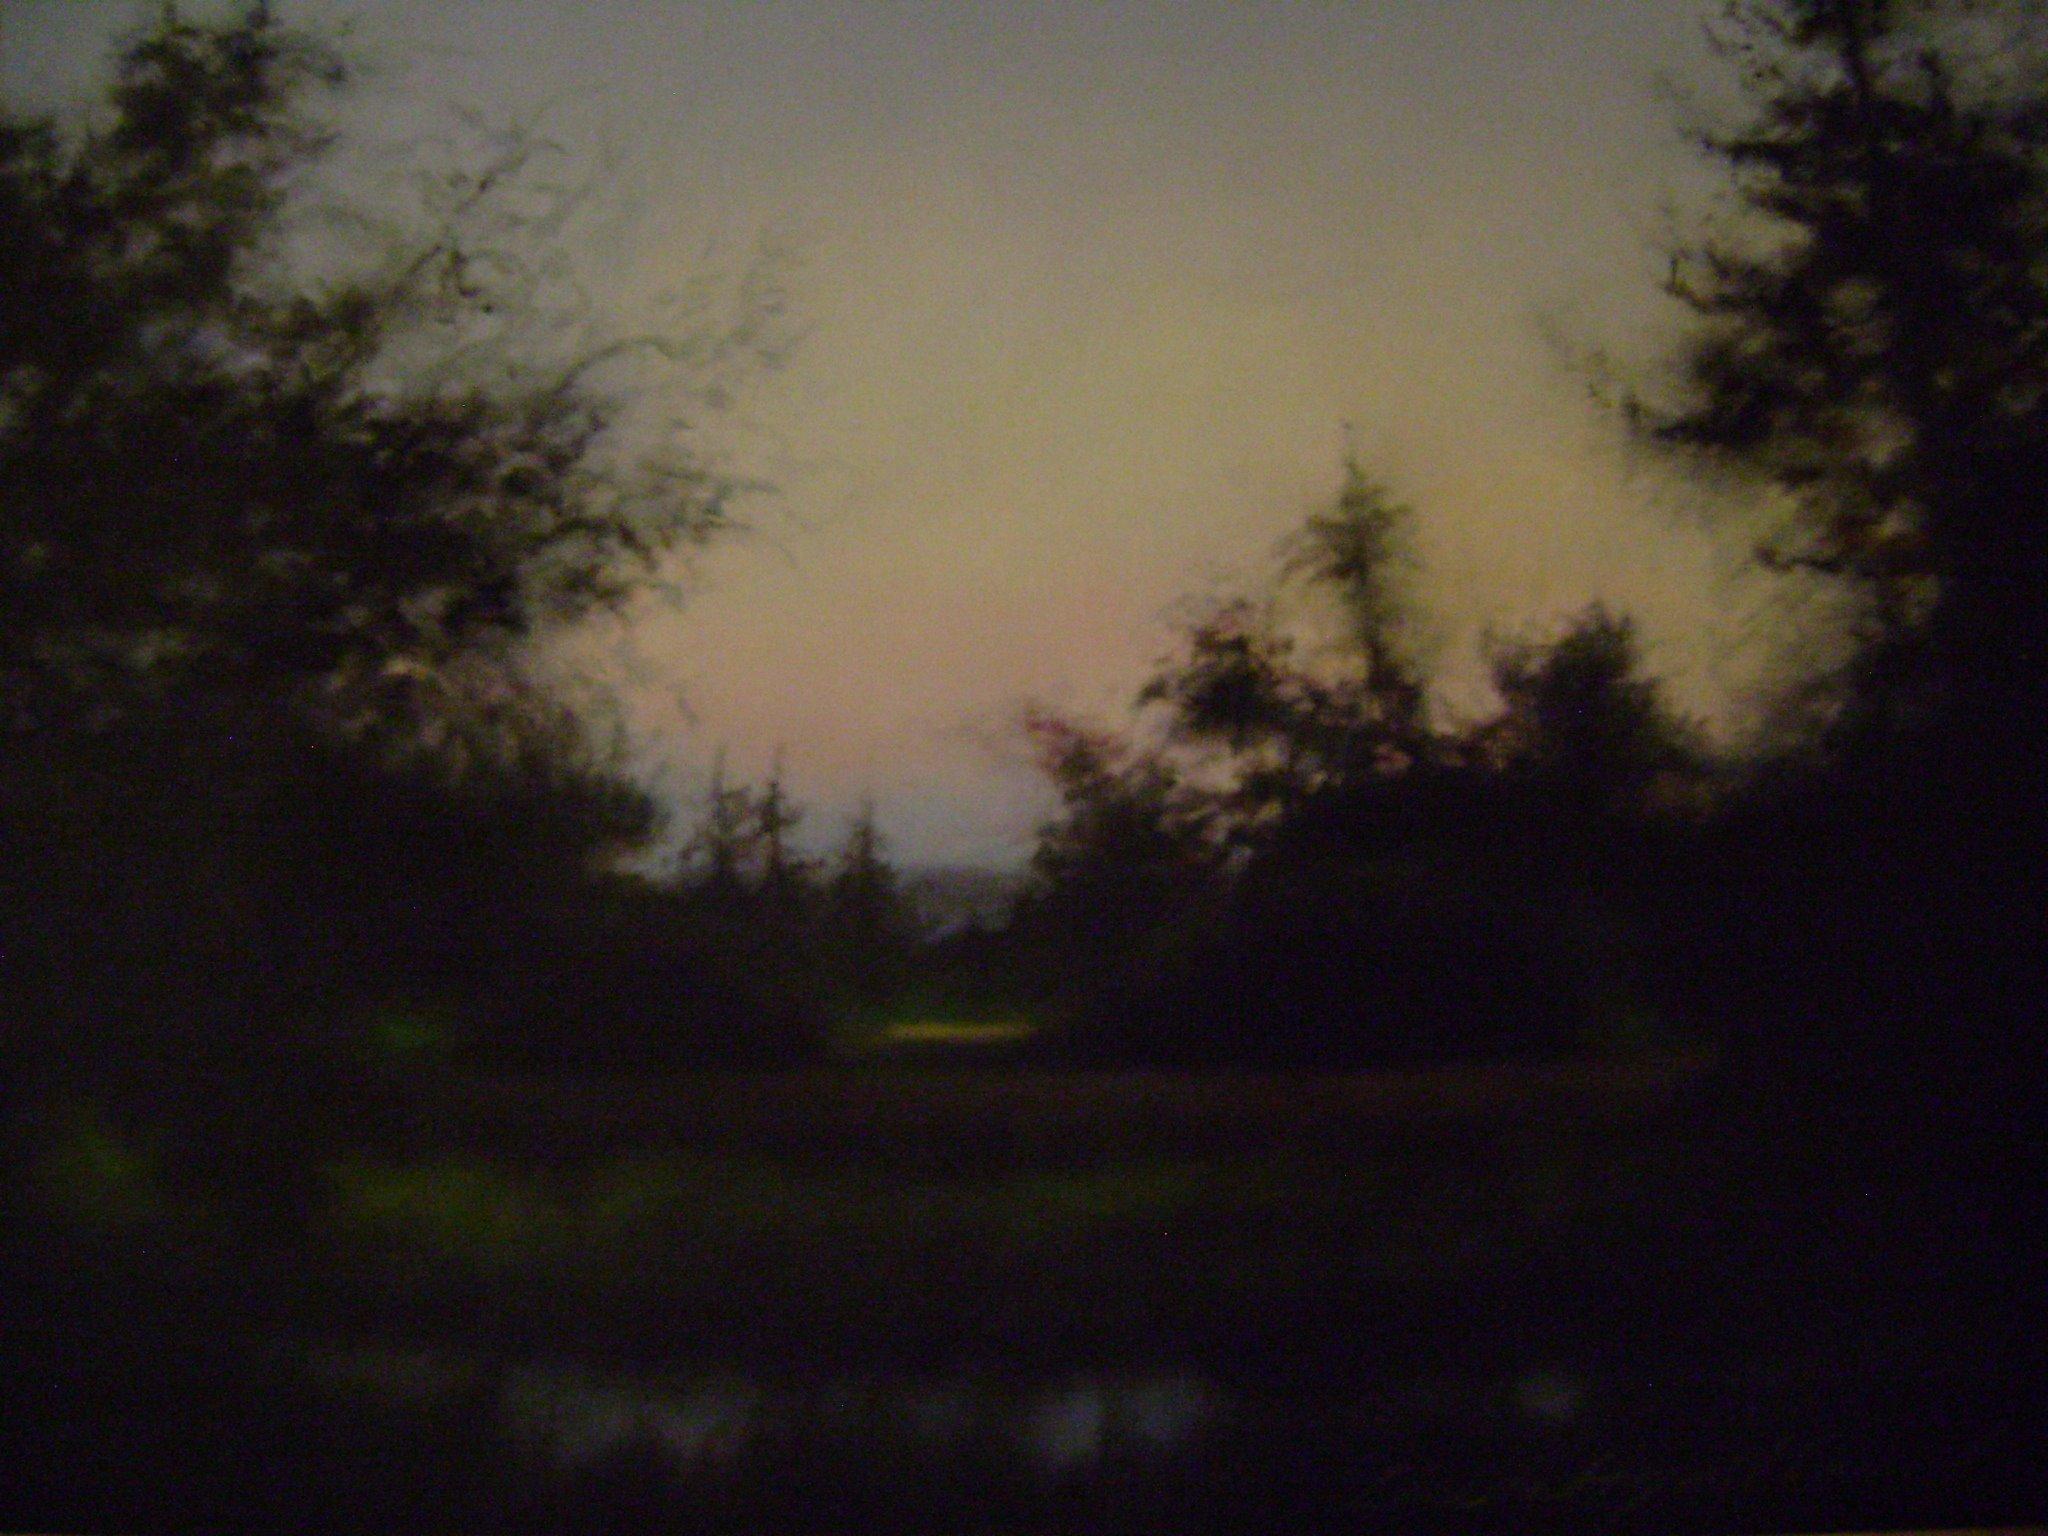 Touchet River